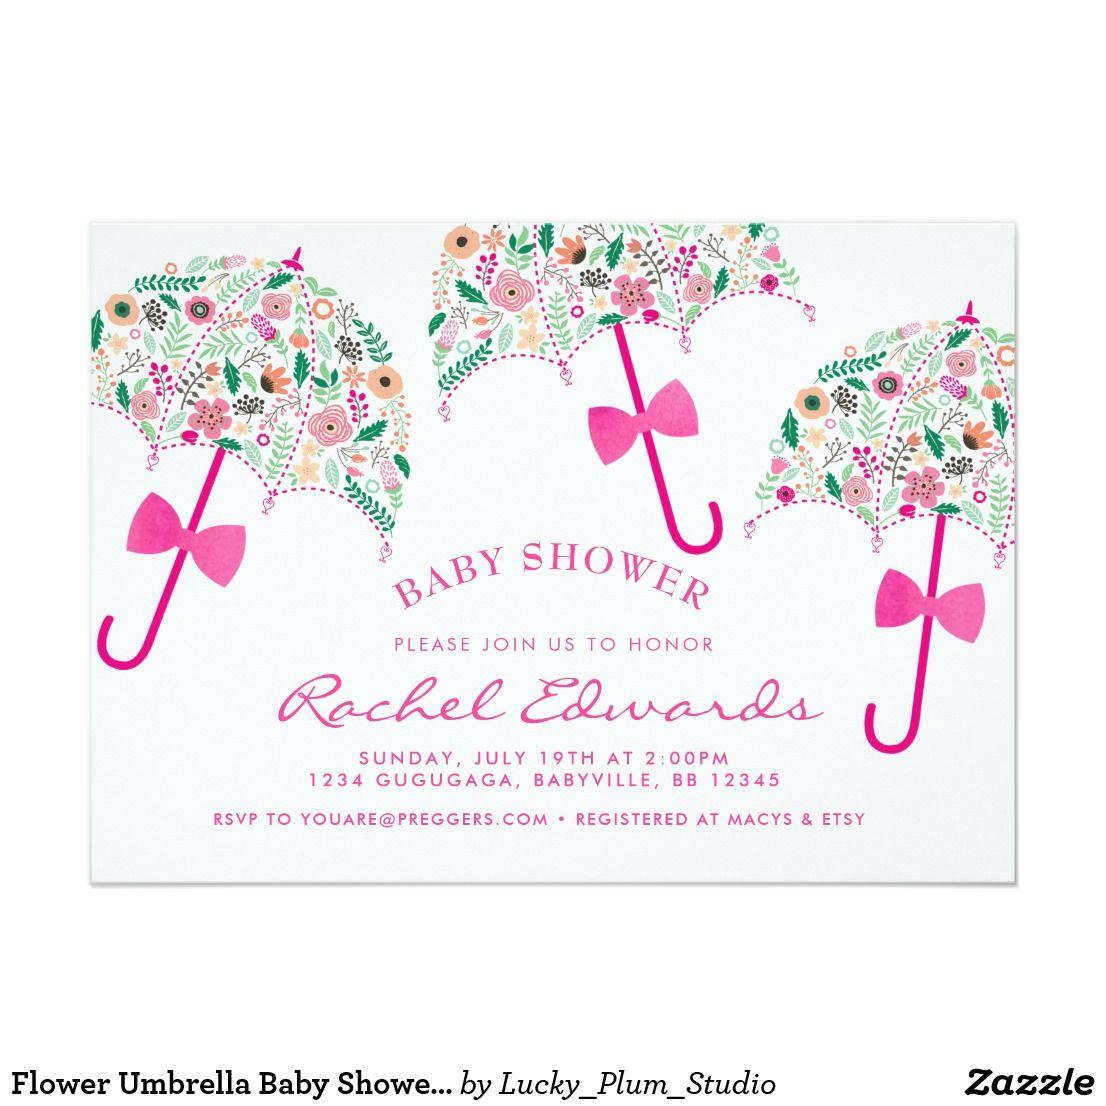 Flower Umbrella Baby Shower Invitation   Mom and Kids Stuffs and ...